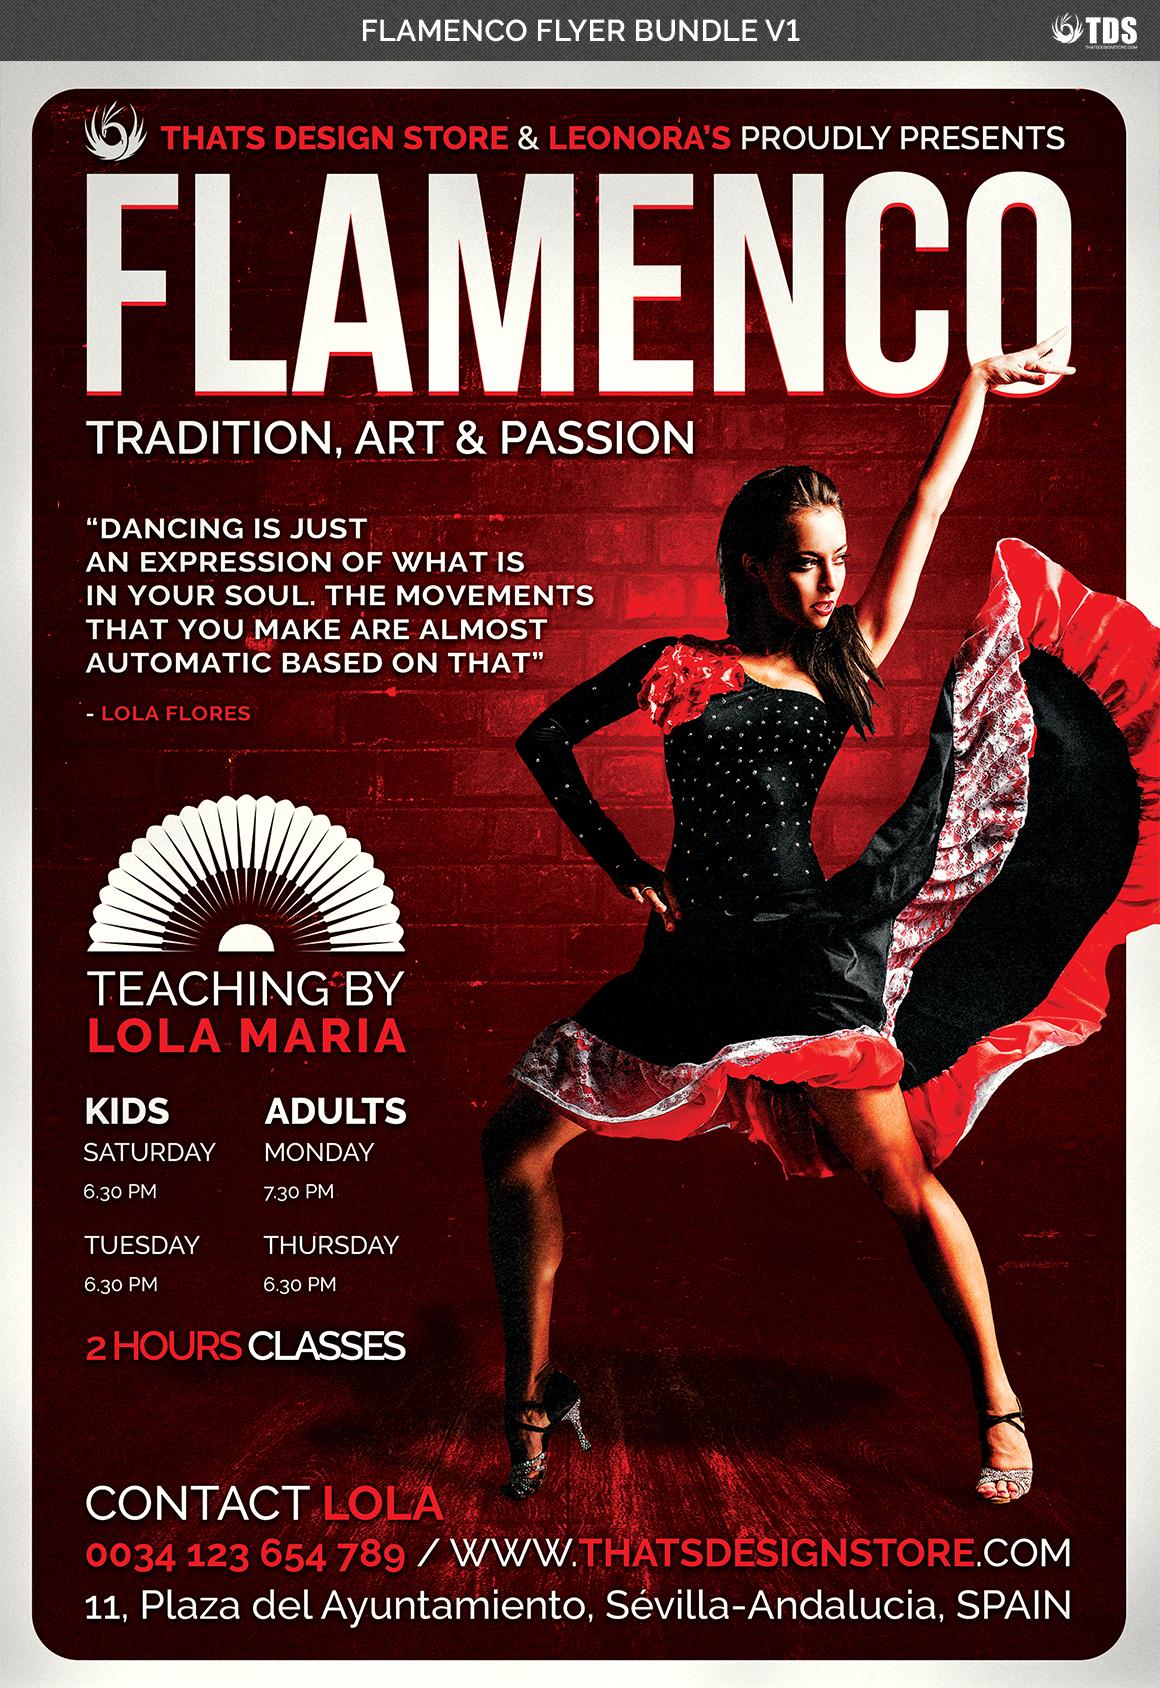 Flamenco Flyer Bundle V1 example image 7